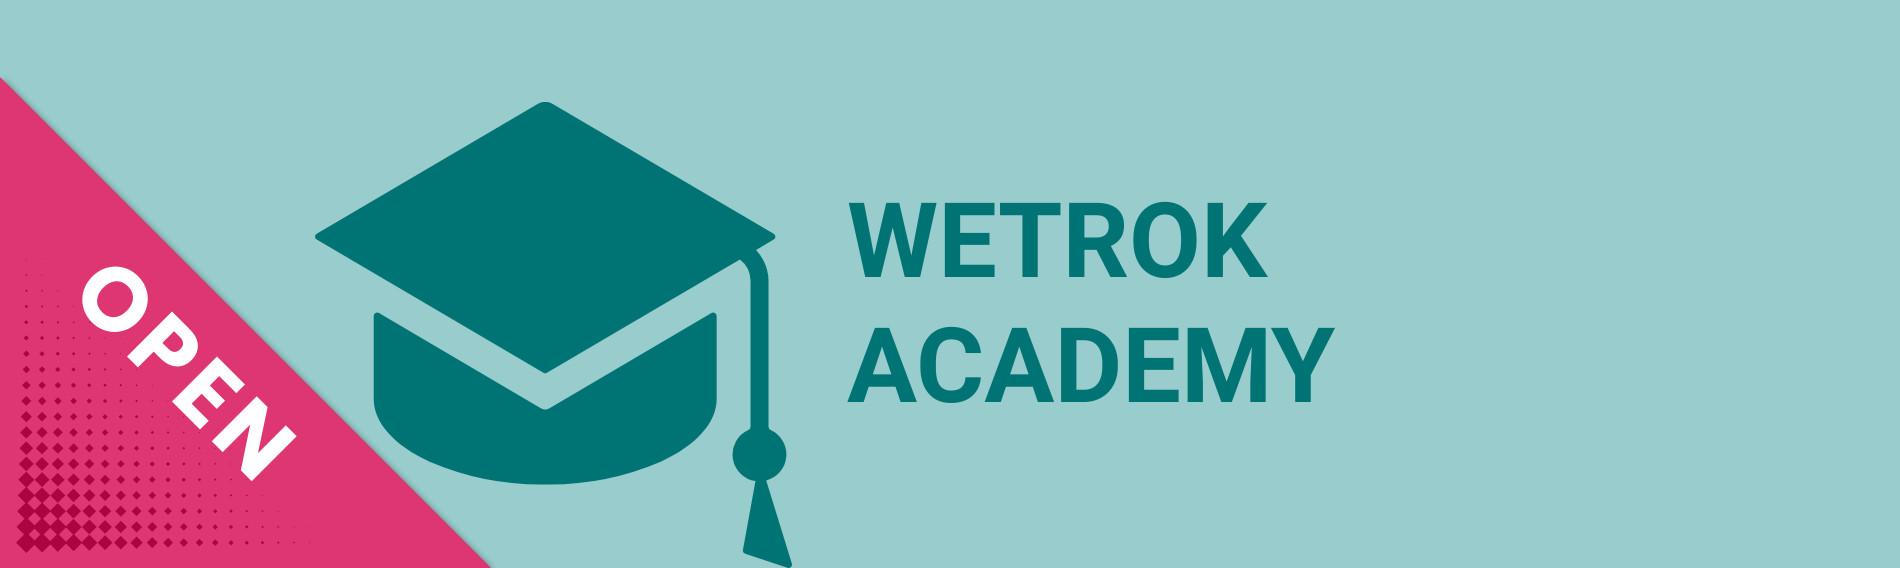 Wetrok Academy